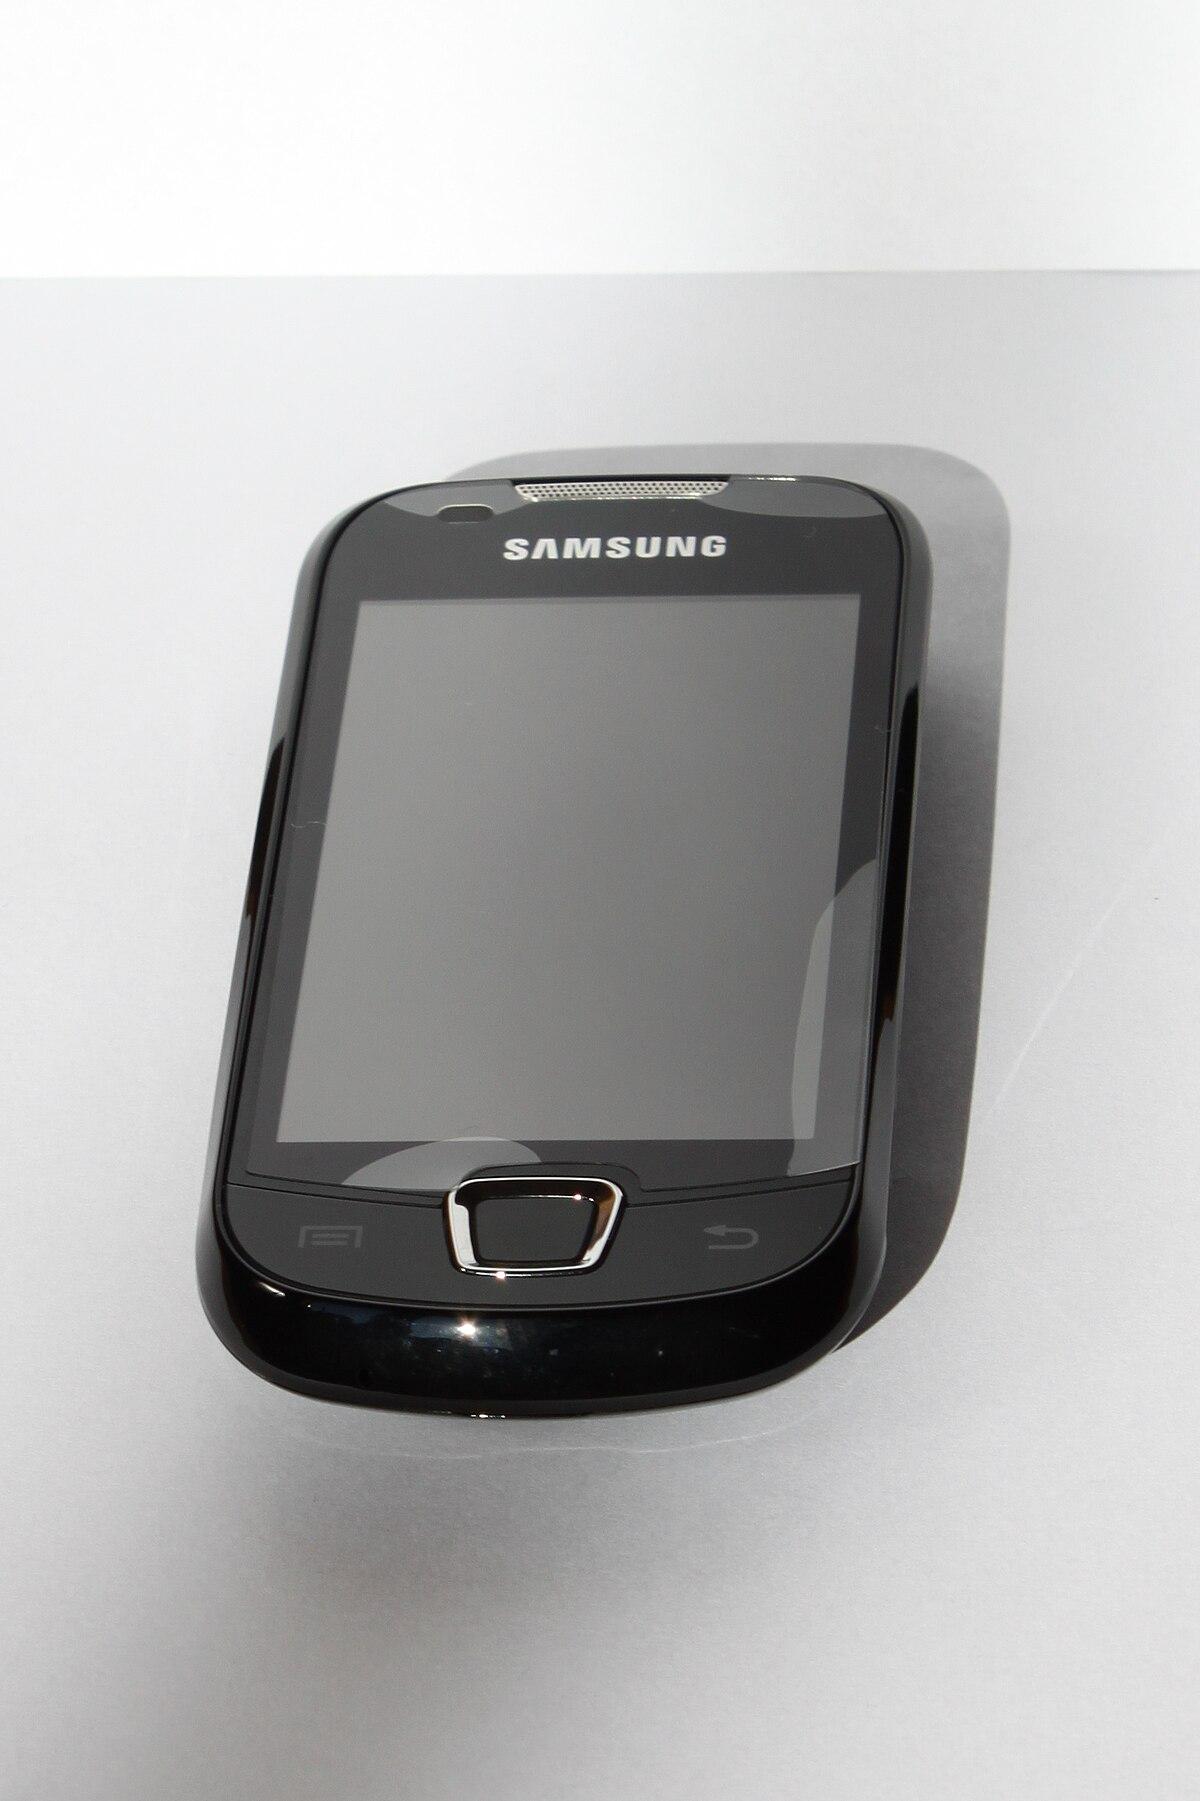 Samsung GT-i5800 - Wikipedia